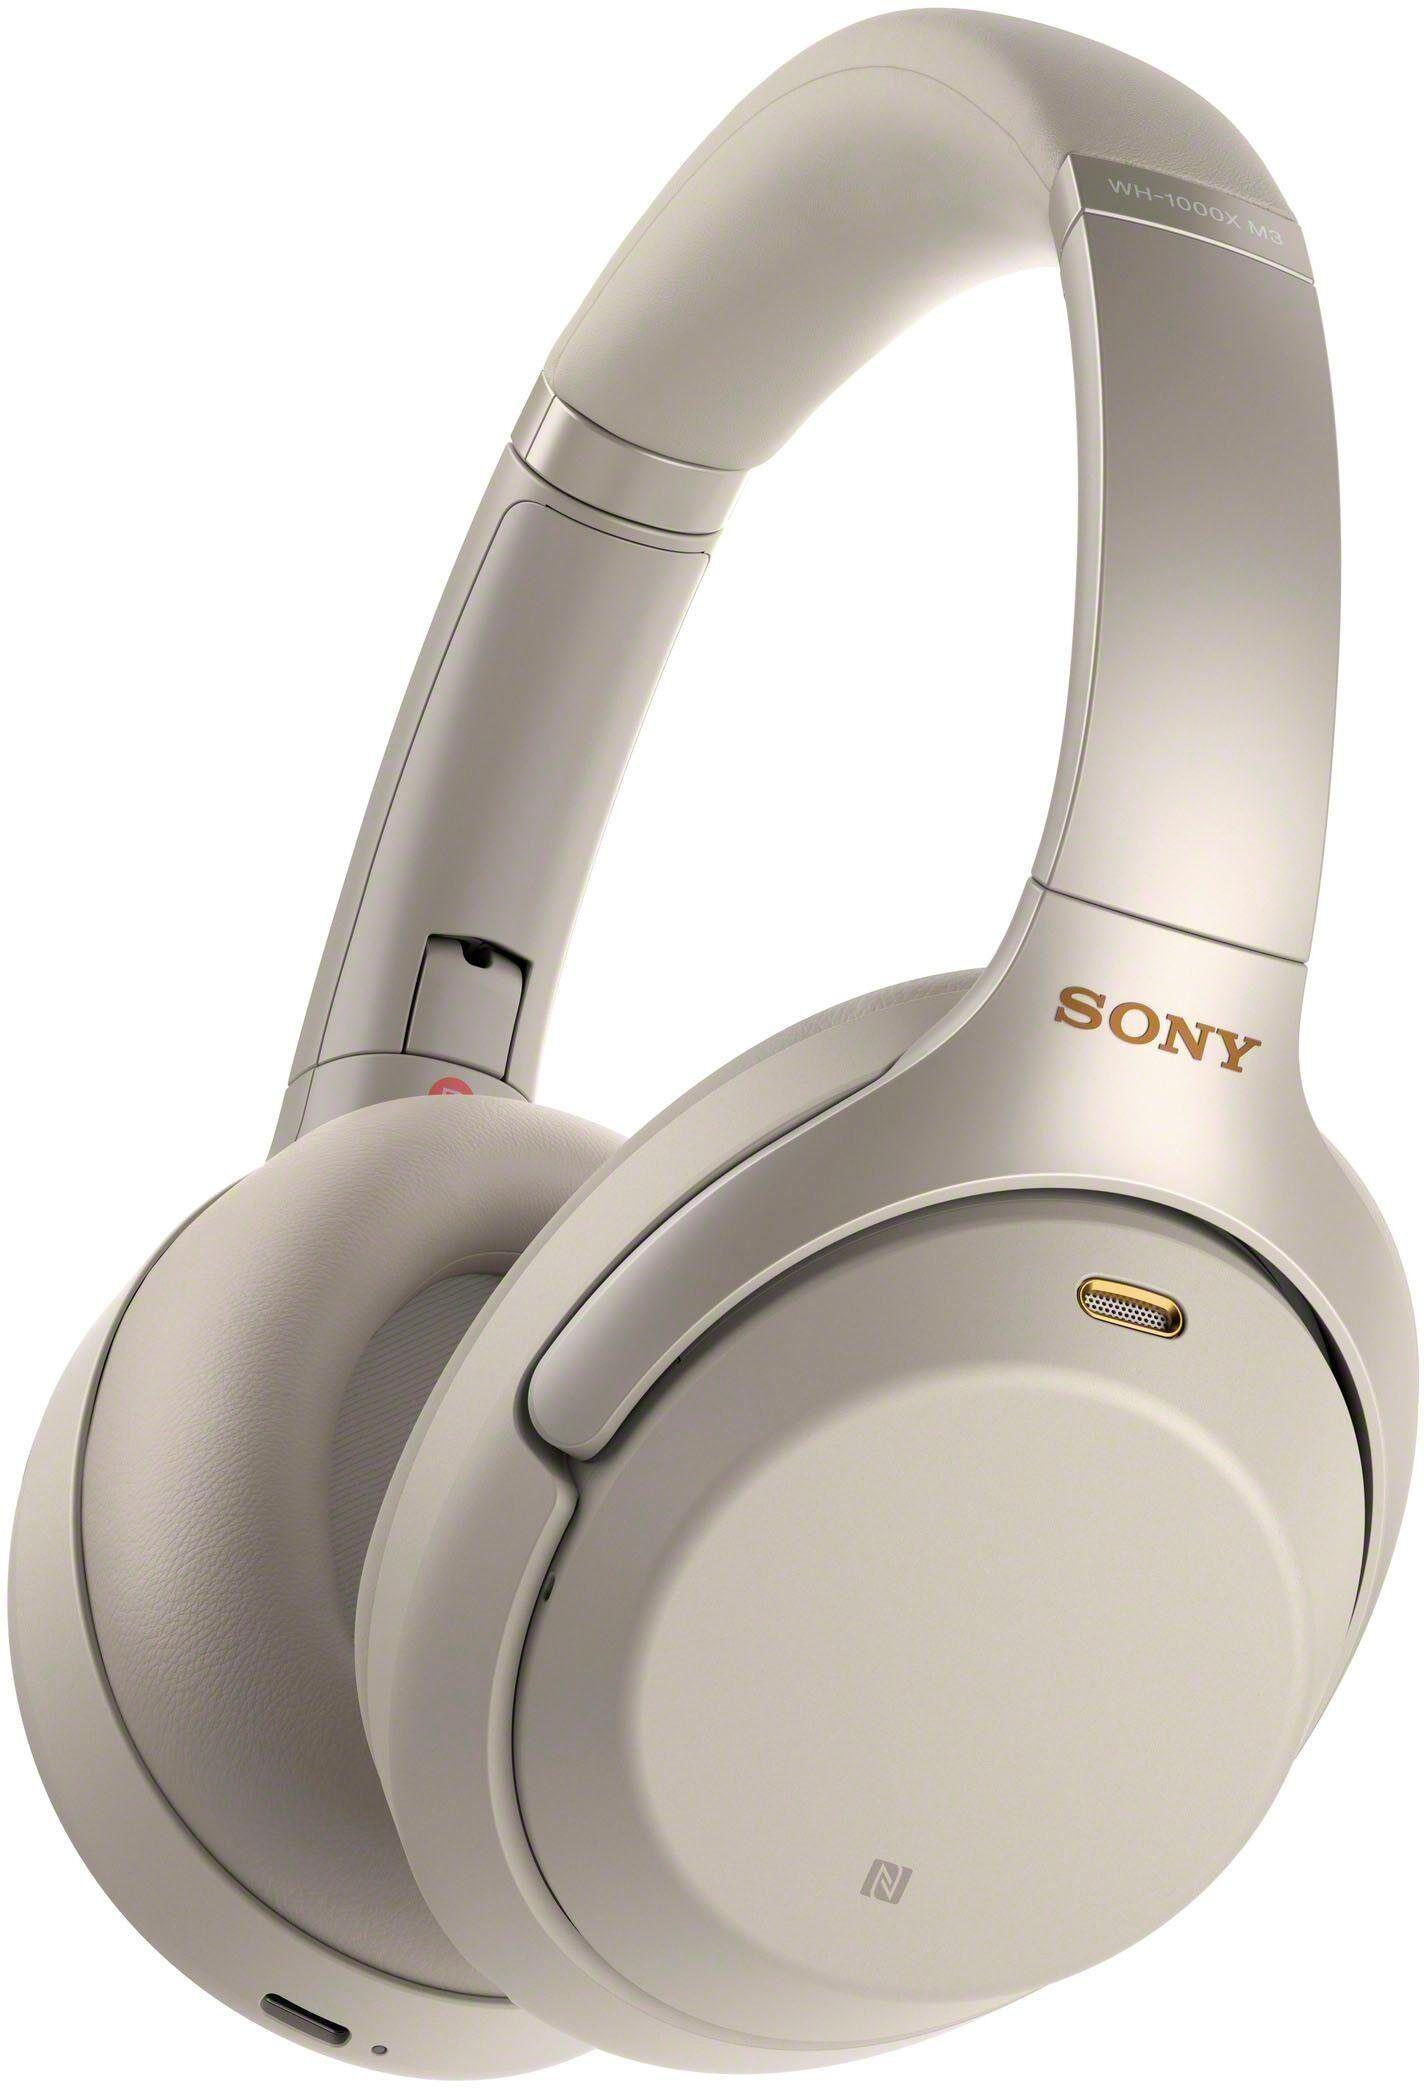 Sony »WH-1000XM3« Over-Ear-Kopfhörer (Bluetooth, NFC, Headset mit Mikrofon, Touch Sensor, Schnellladefunktion), Silber